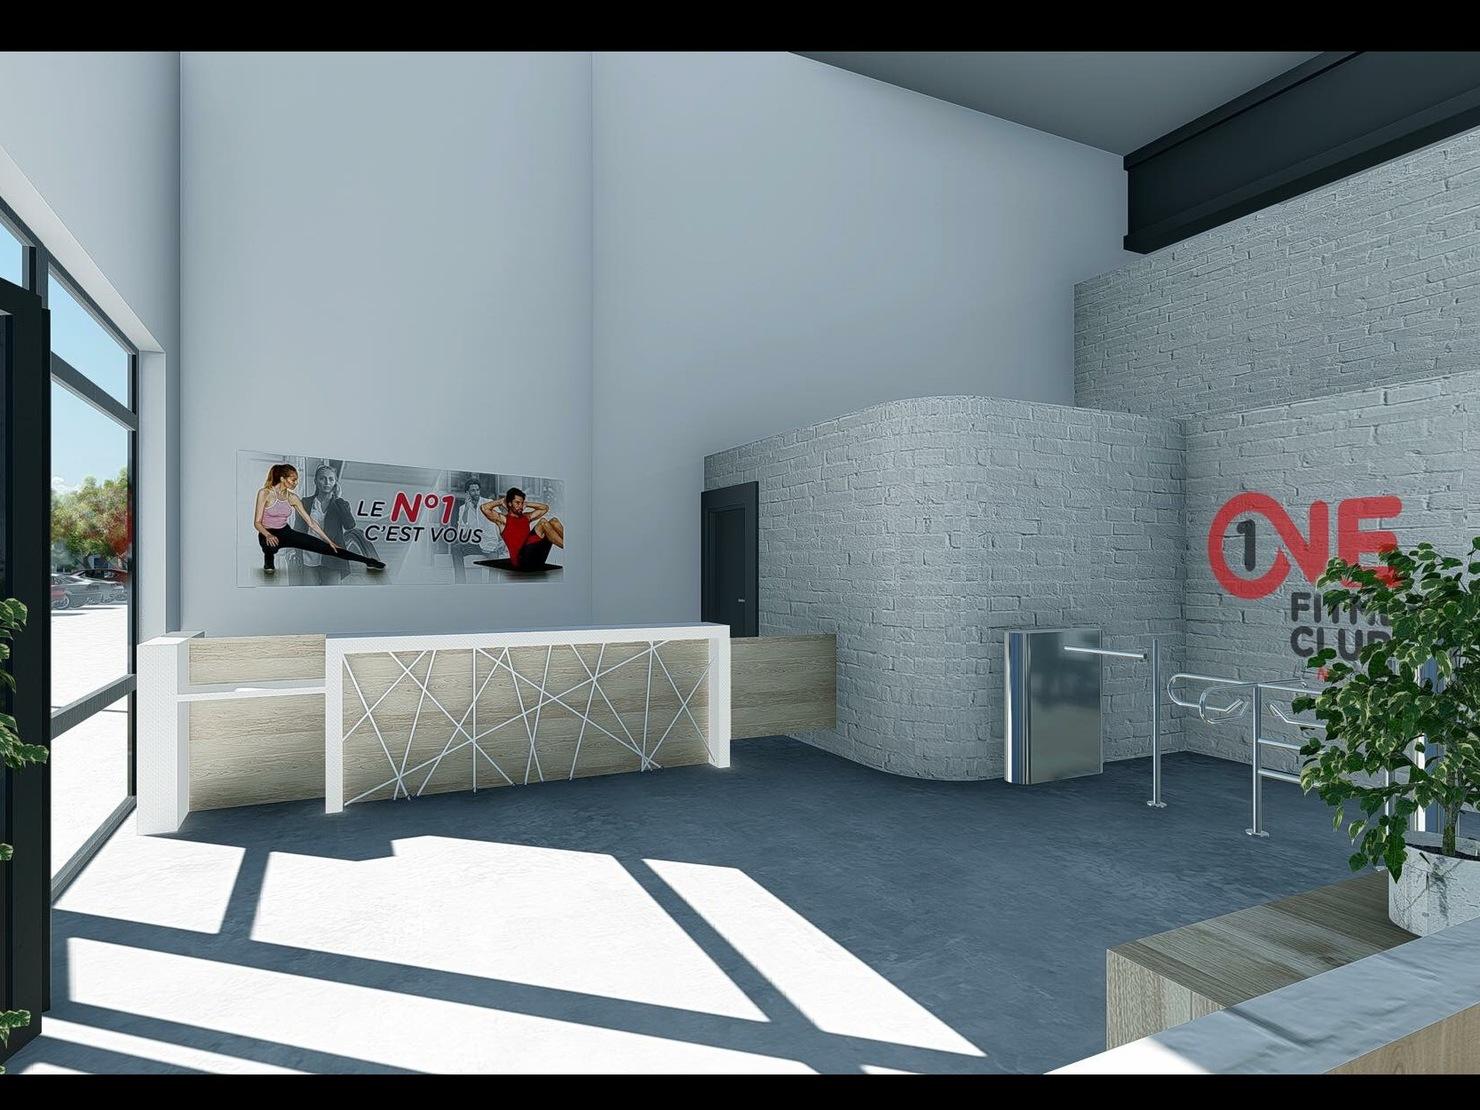 one fitness club avignon tarifs avis horaires essai gratuit. Black Bedroom Furniture Sets. Home Design Ideas